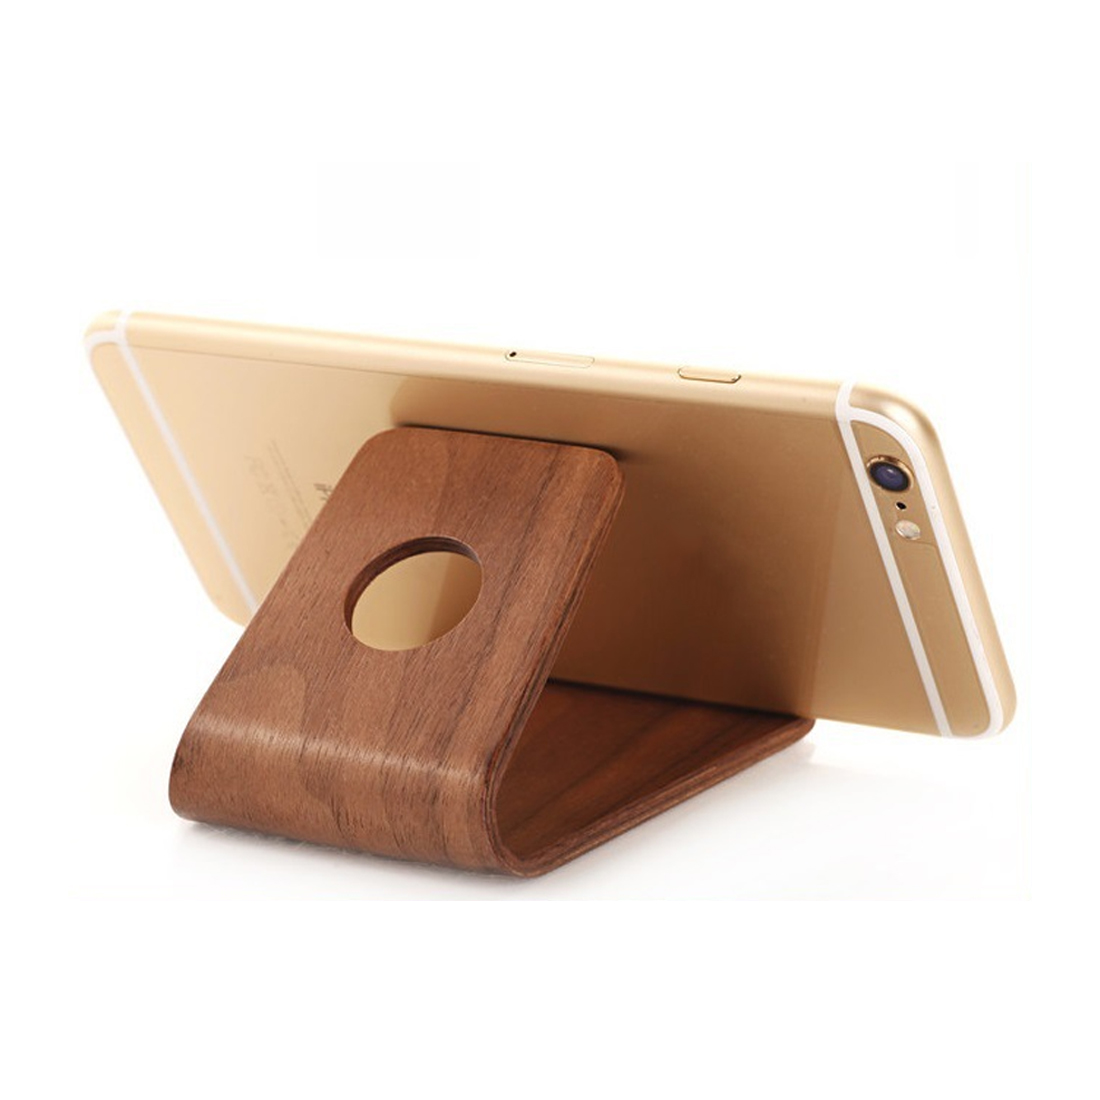 Etmakit Hot Birch/Walnut Lightweight Slim Design Wooden Mobile Phone Stand Holder For IPhone X 8 7 Plus Samsung Galaxy S8 Note5